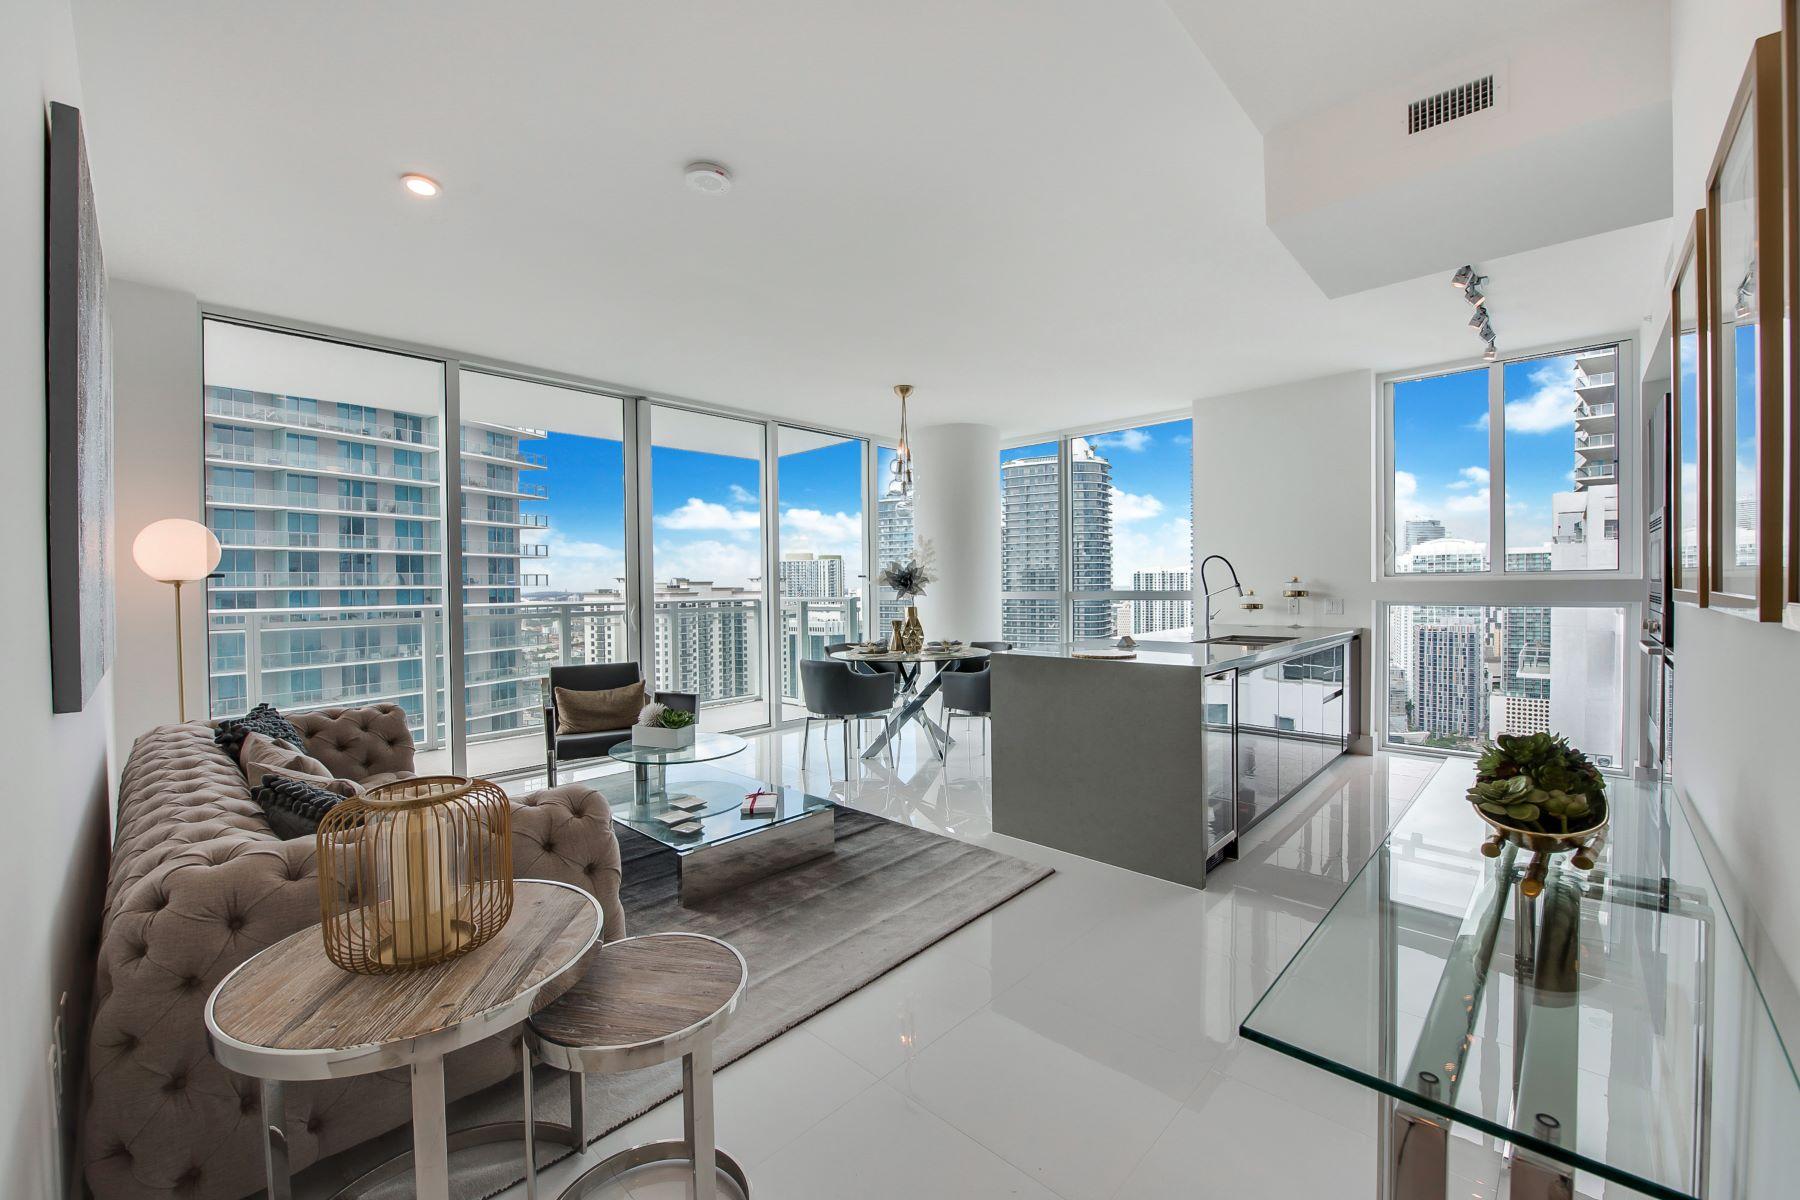 Condominium for Sale at 1080 Brickell Ave 1080 Brickell Ave 3609, Miami, Florida, 33131 United States